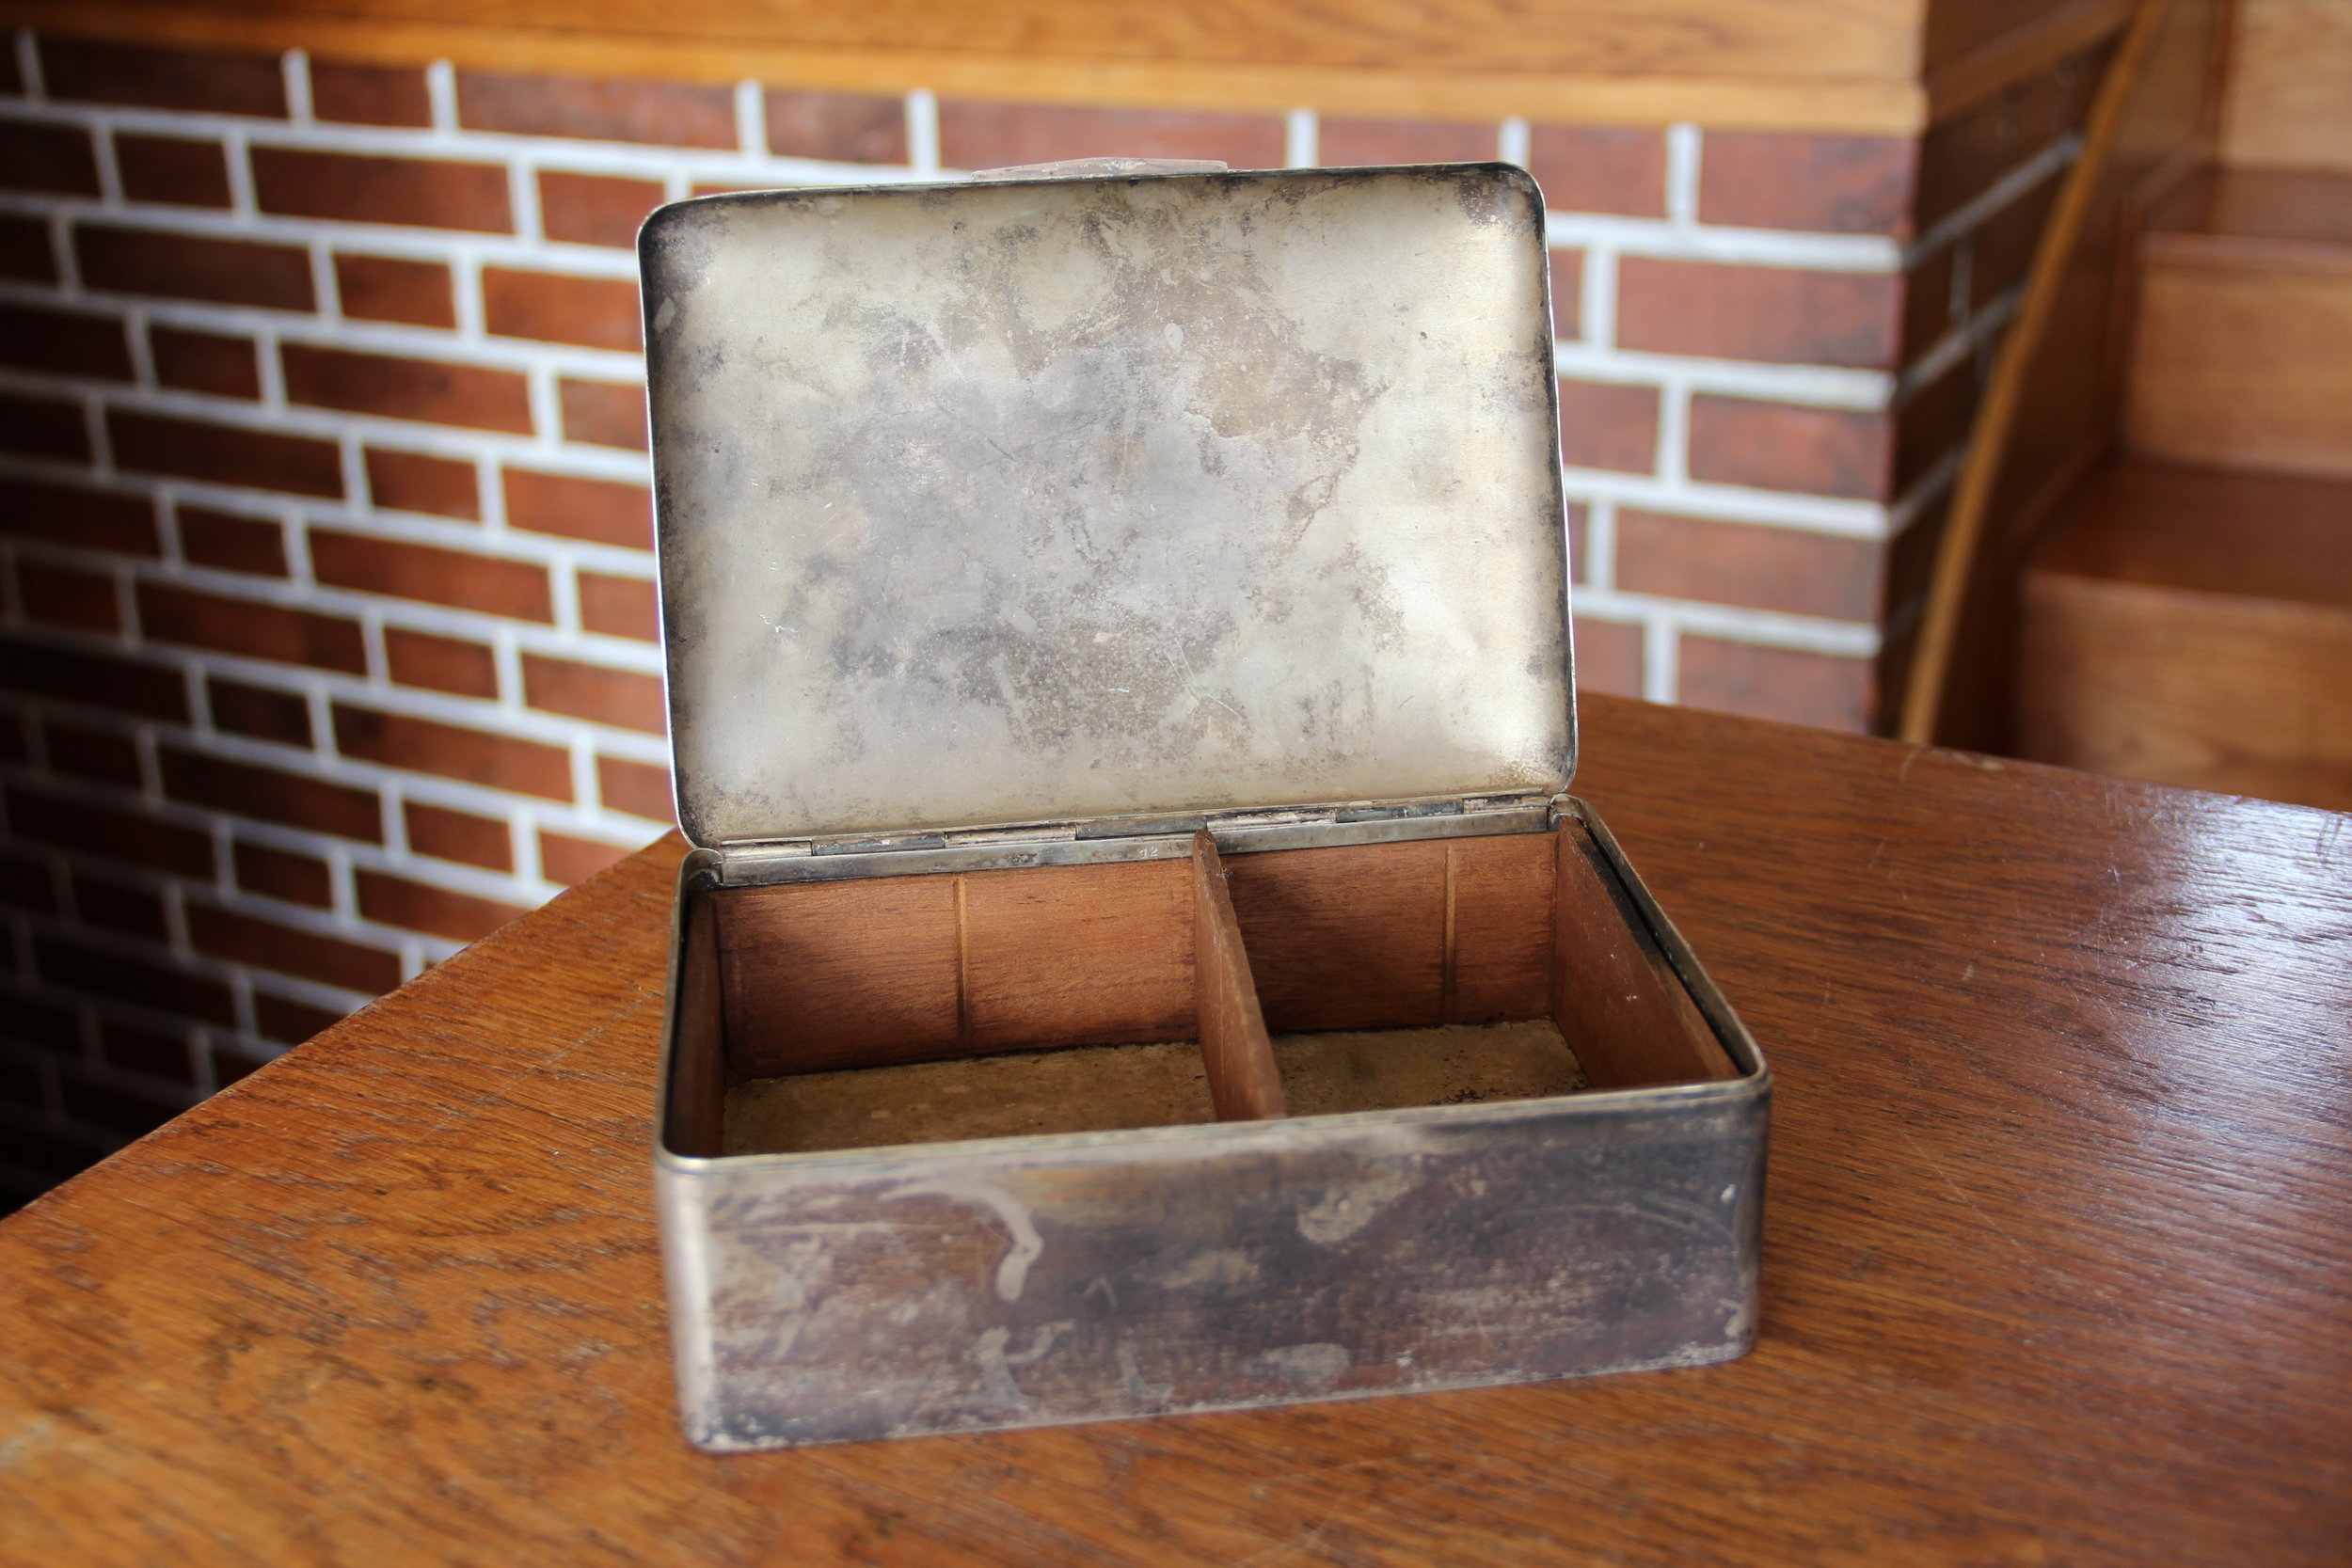 6. Krabička na karty, kov a dřevo, vyvolávací cena 800,- Kč